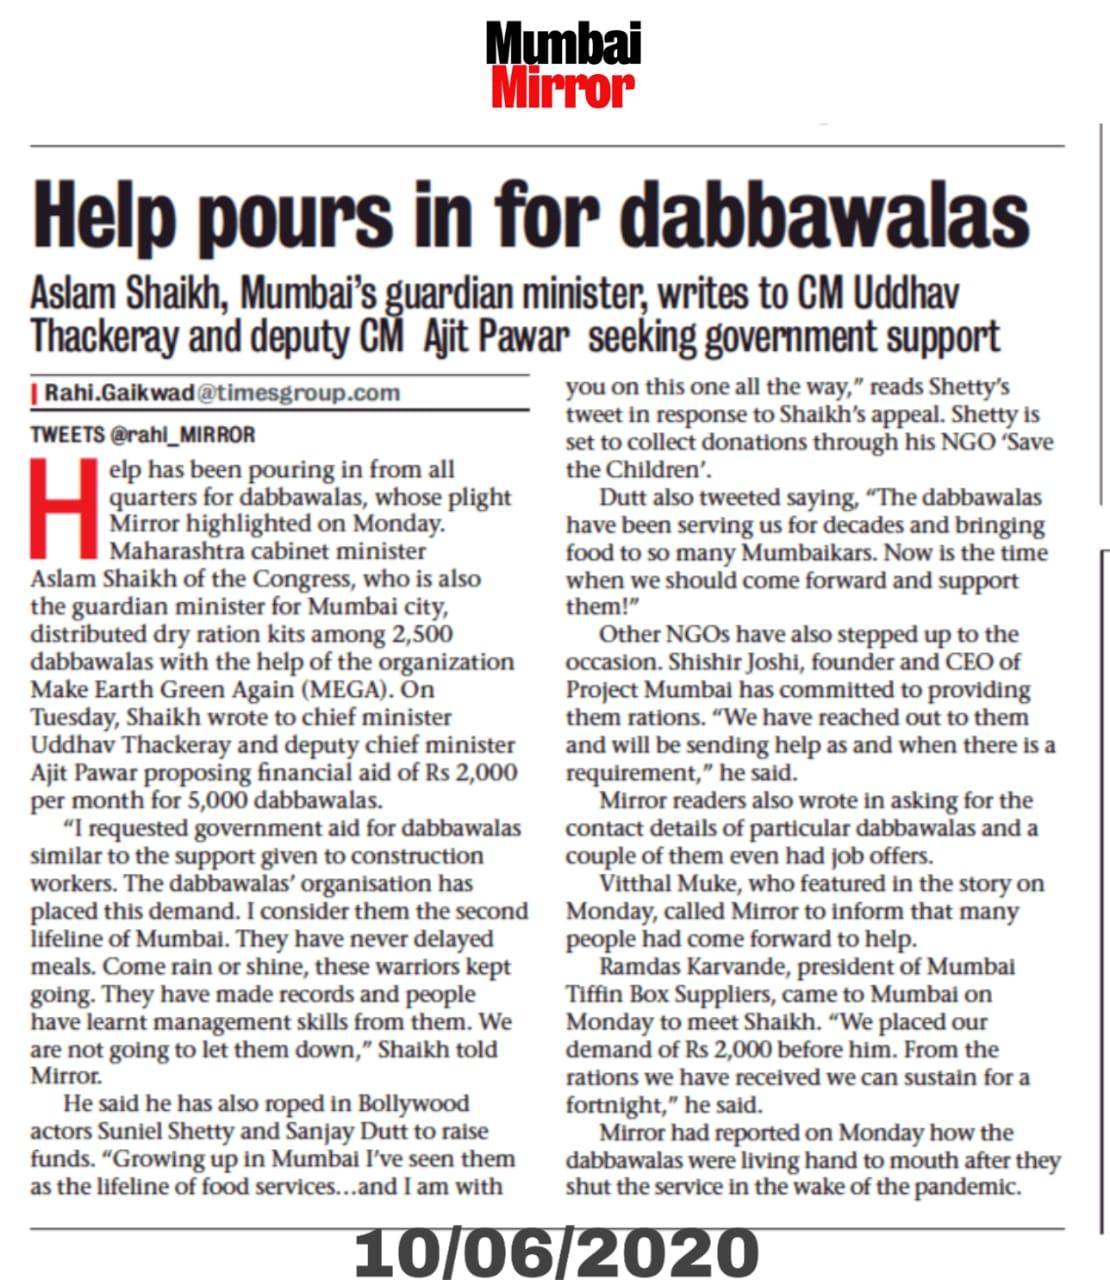 Help pours in for Mumbai's dabbawalas; Minister Aslam Shaikh writes to CM Thackeray, Ajit Pawar